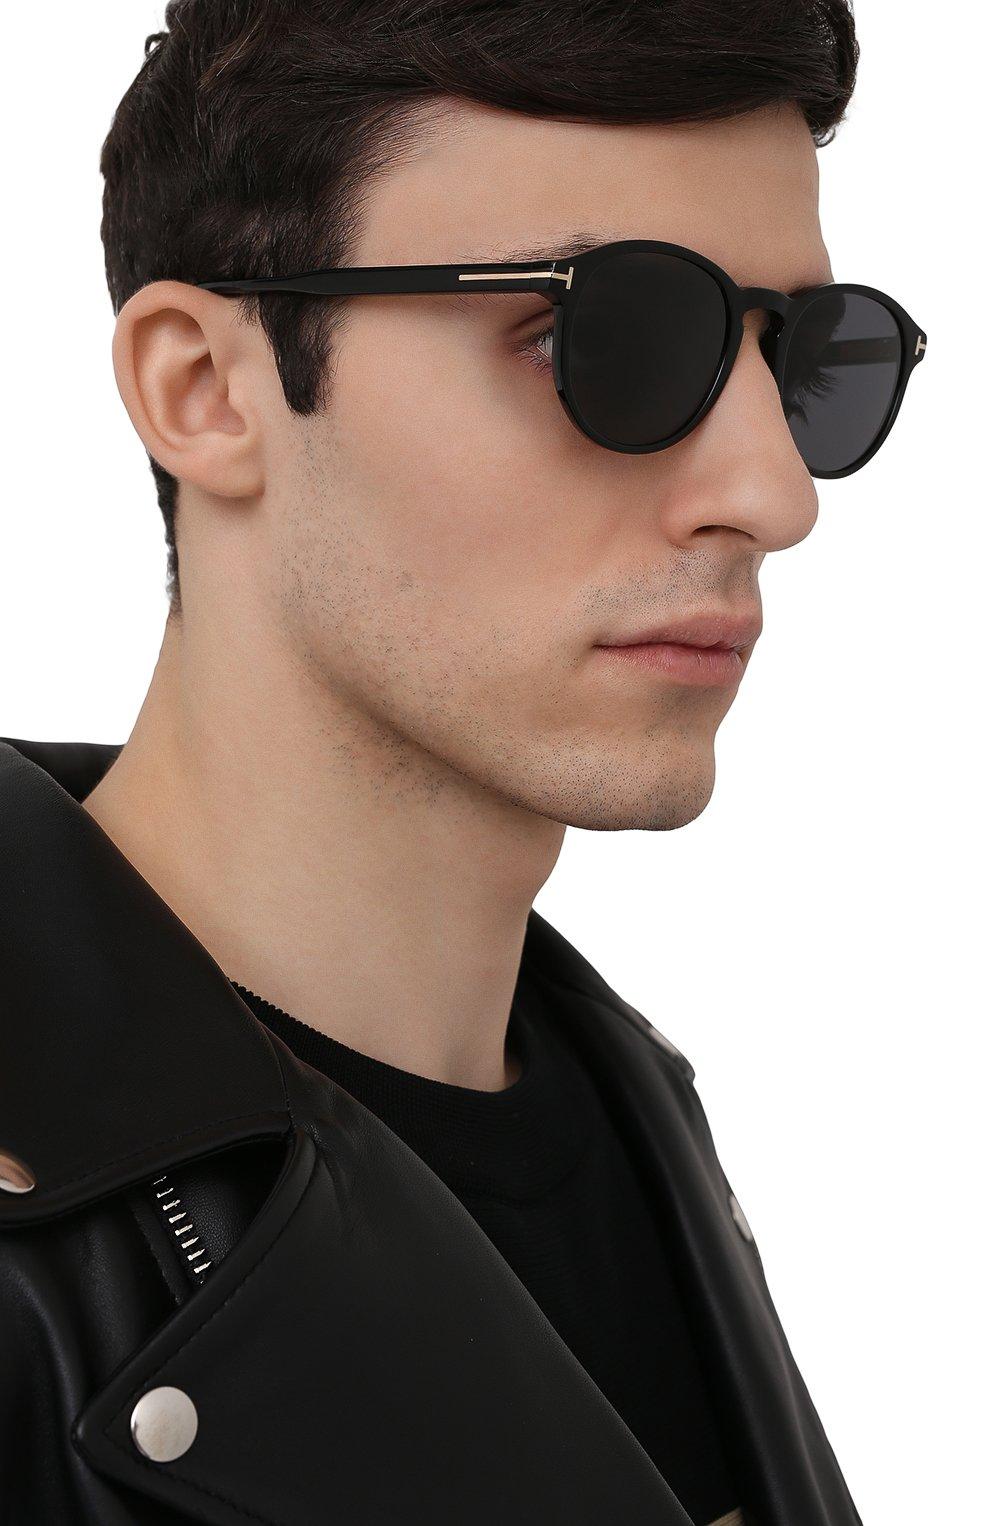 Мужские солнцезащитные очки TOM FORD черного цвета, арт. TF834 01A | Фото 2